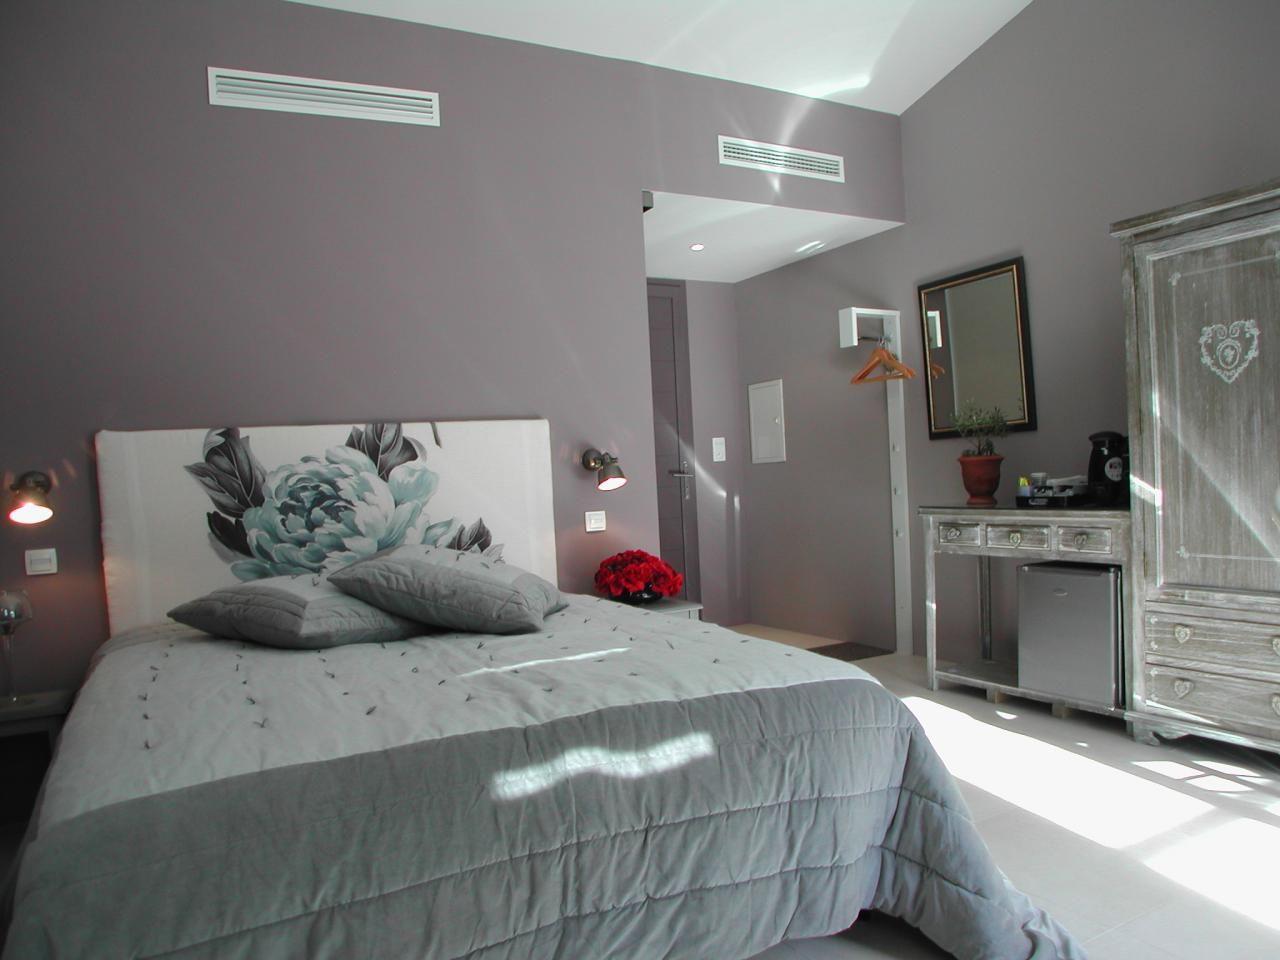 chambre grise - Recherche Google   Bedroom   Pinterest   Chambre ...